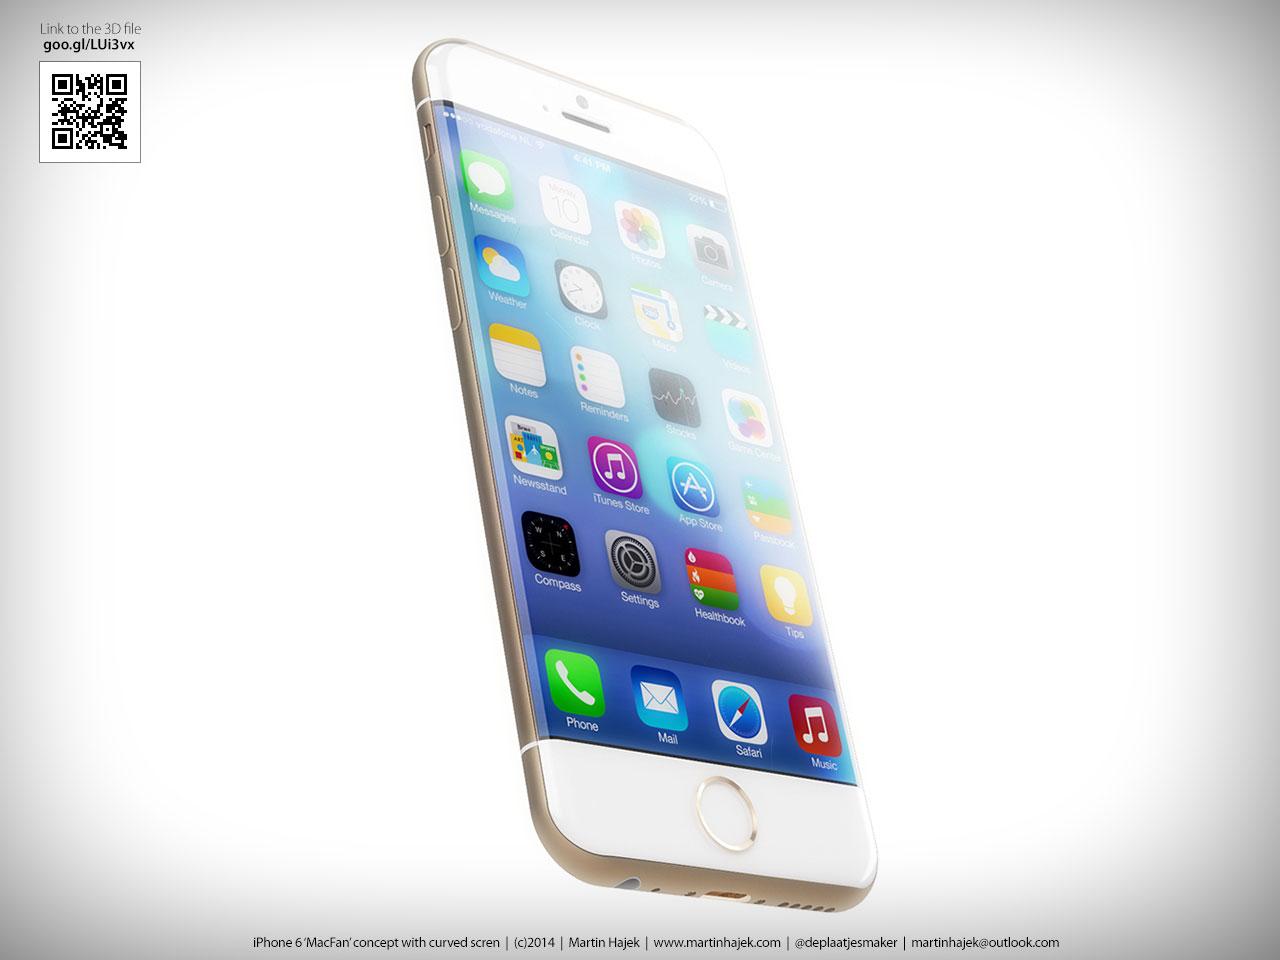 Conceito iPhone 6